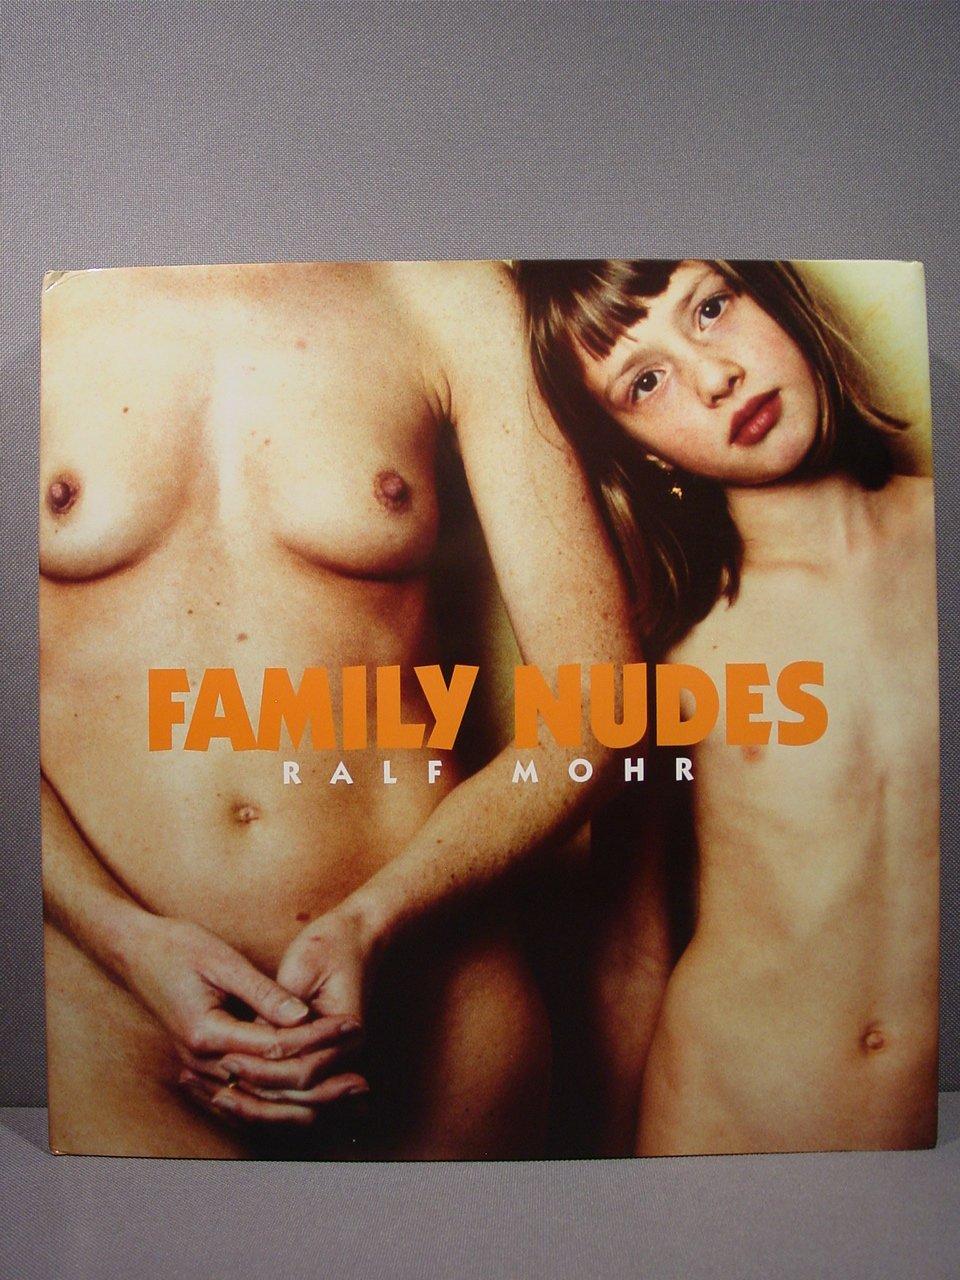 Family nude portraits afraid, that